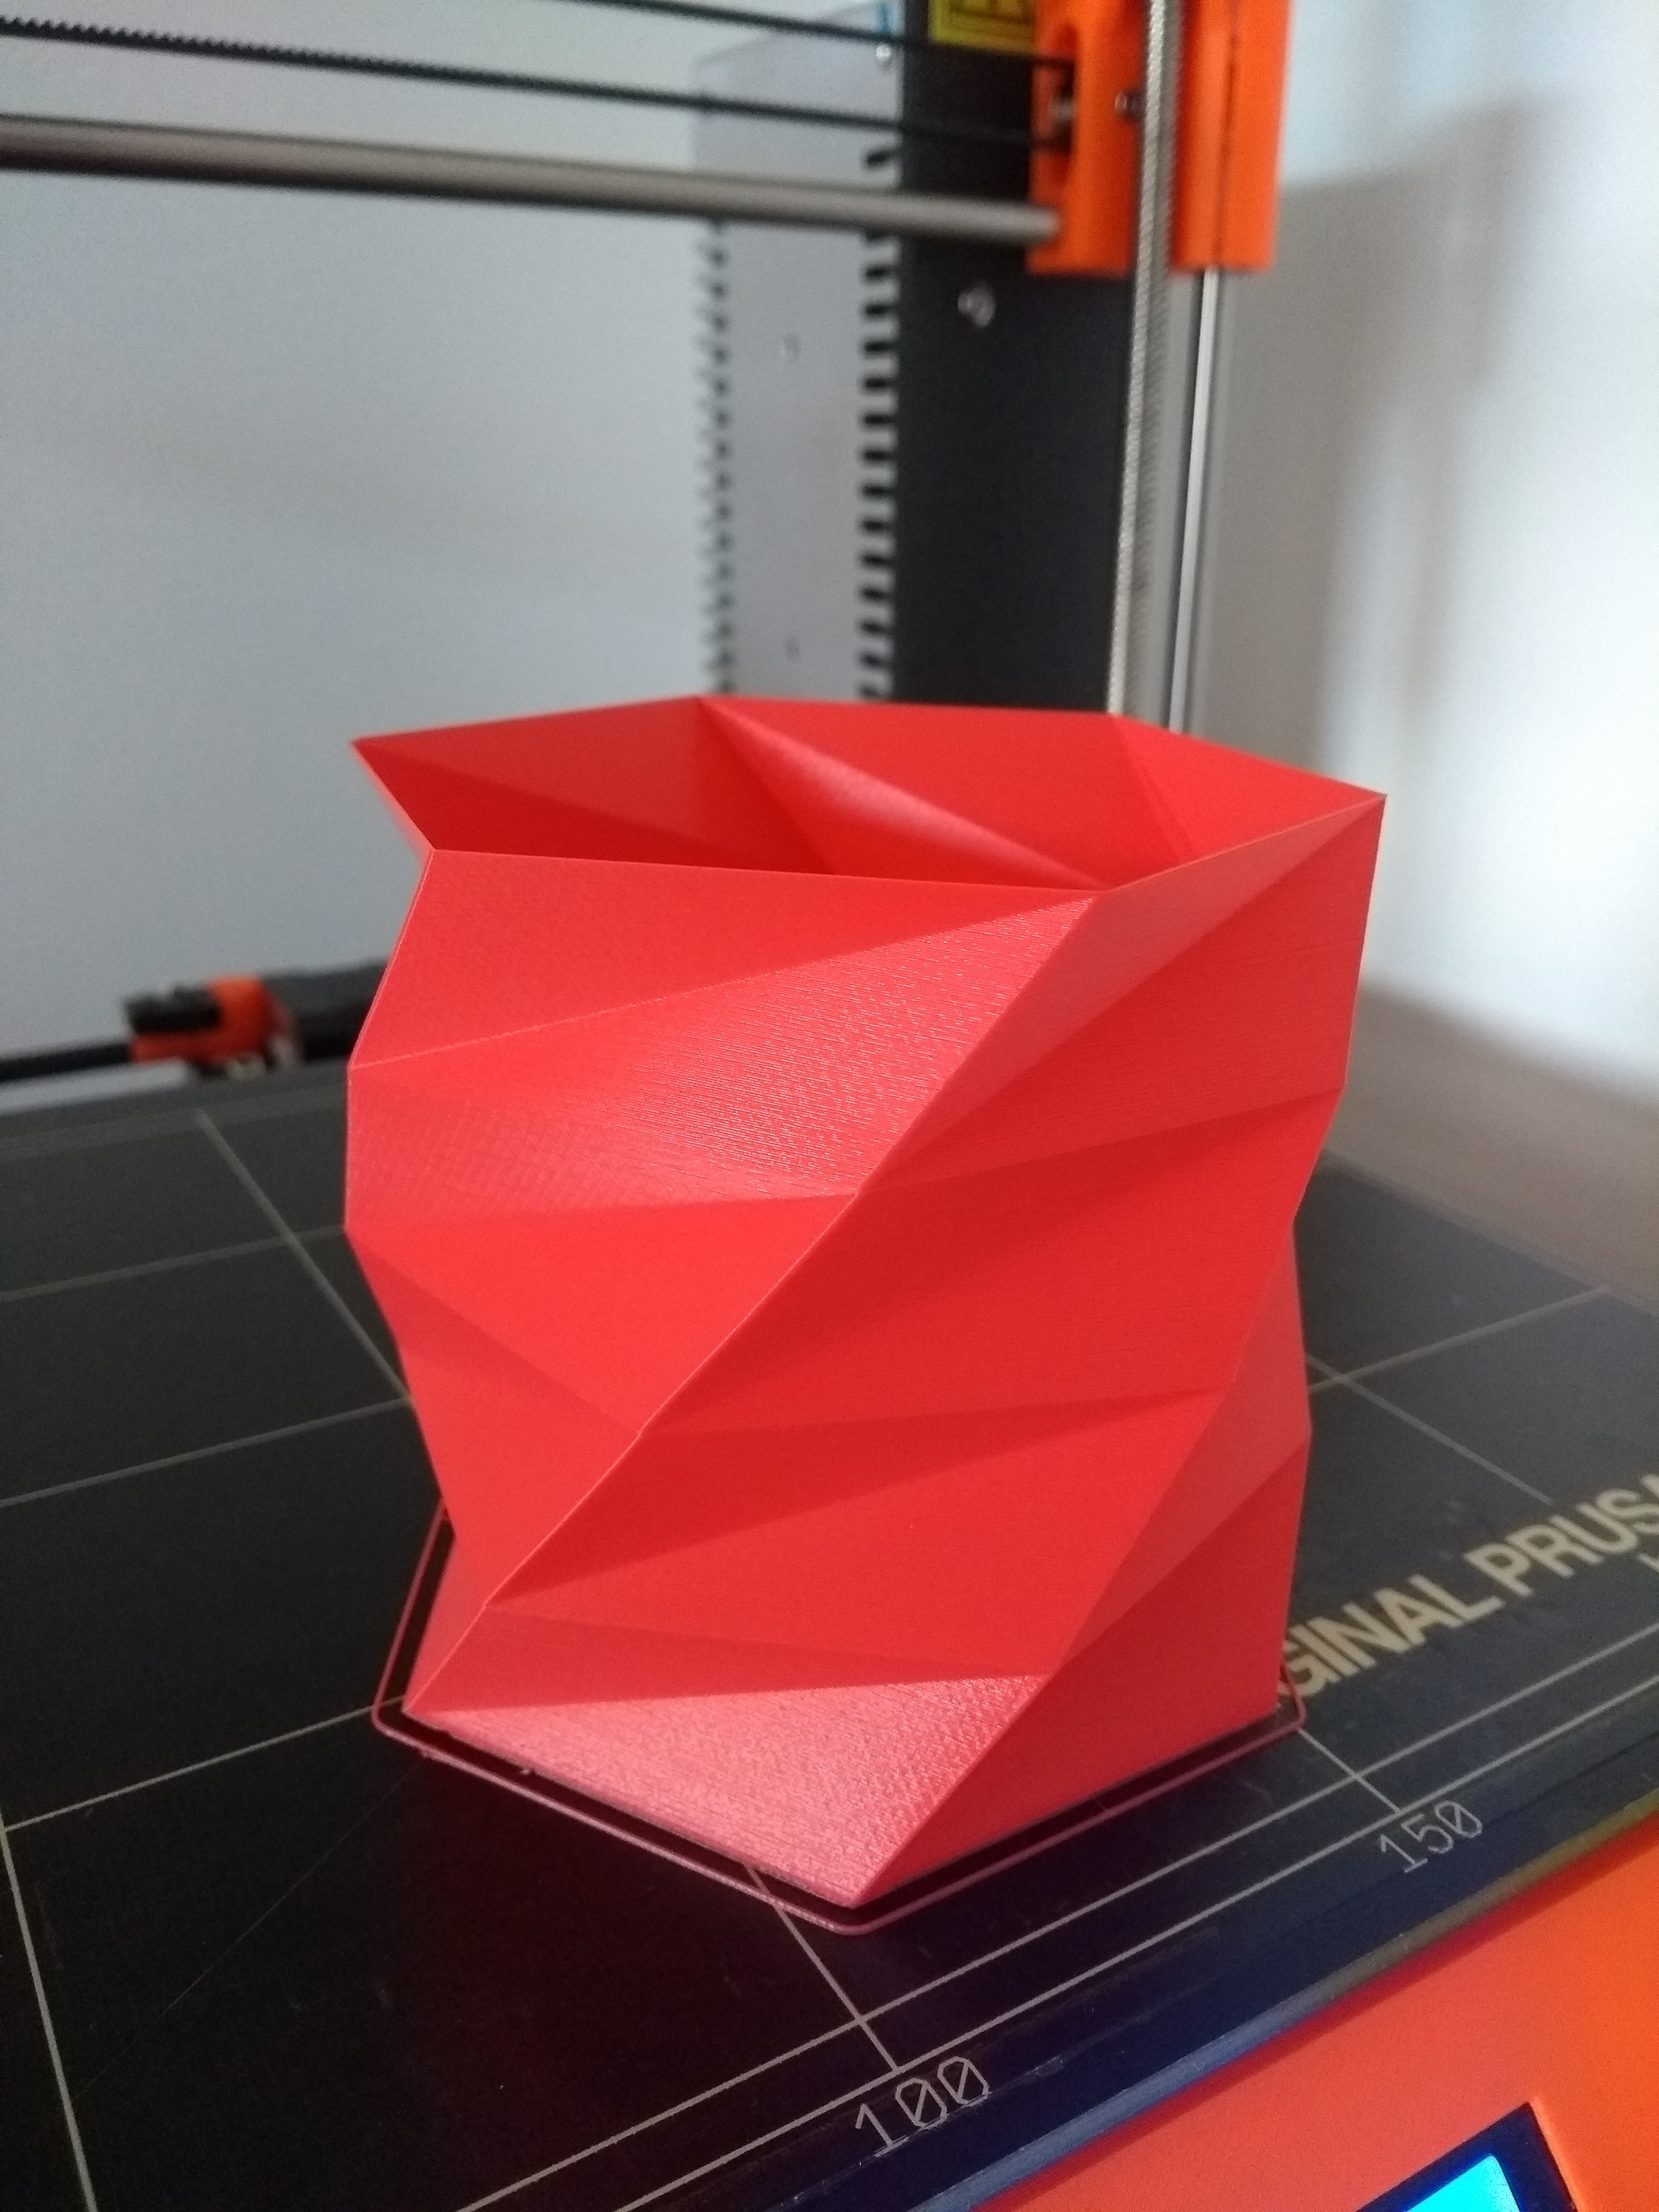 2020-01-11_16.14.45.jpg Download free STL file Poly Low Porta lapiceros - Pen Holder • 3D print model, Centro3D